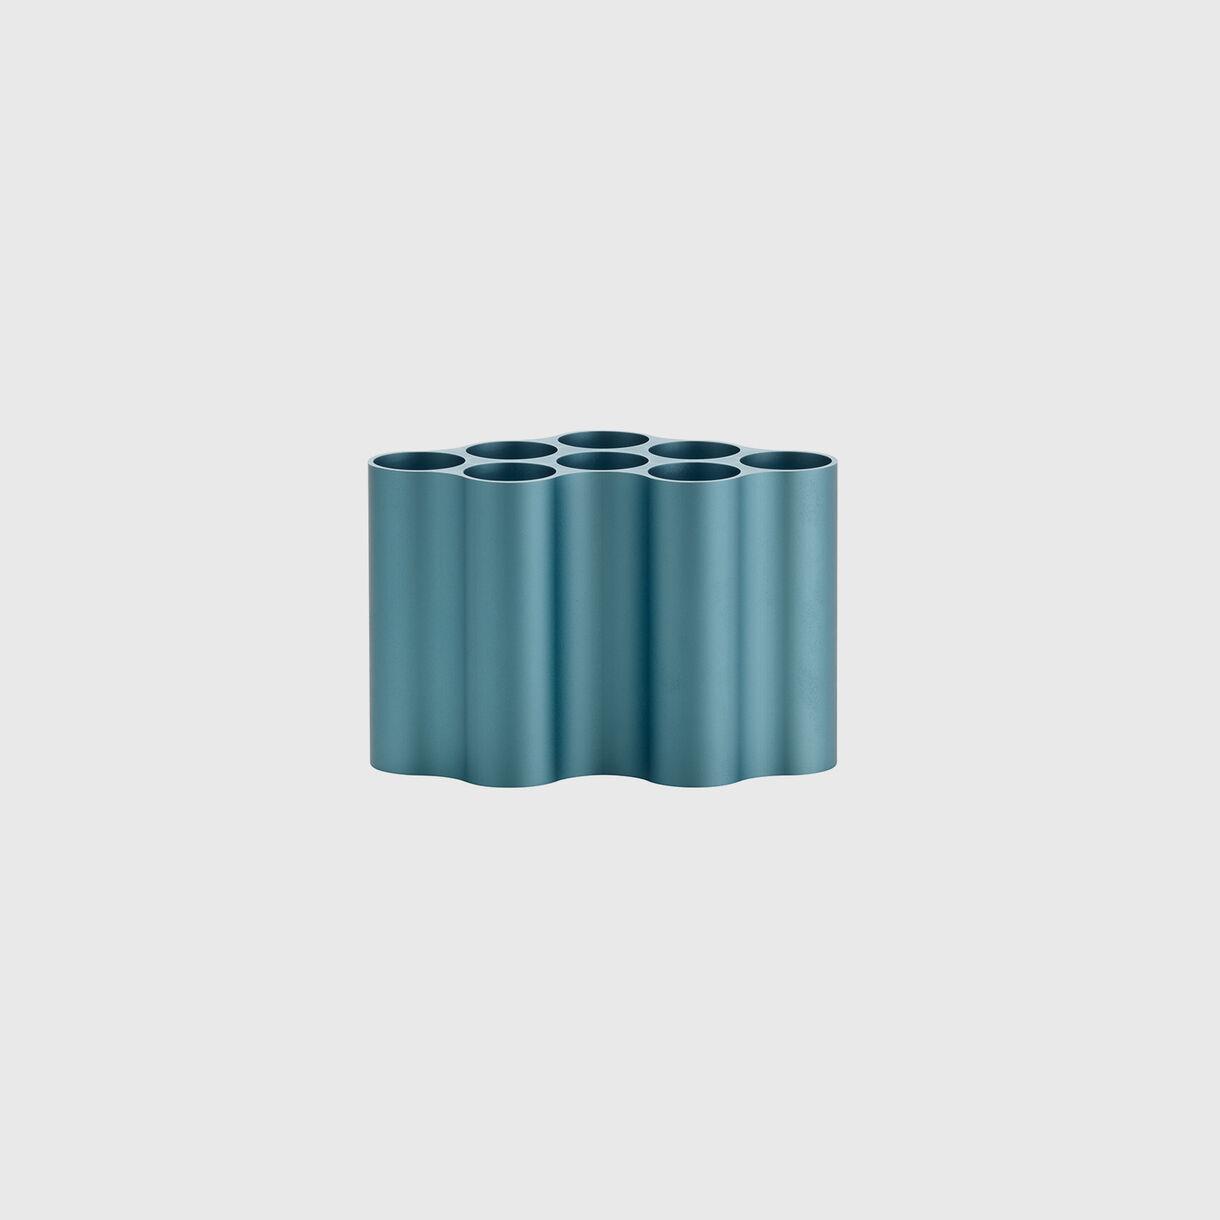 Nuage Vase Pastel Blue, Small